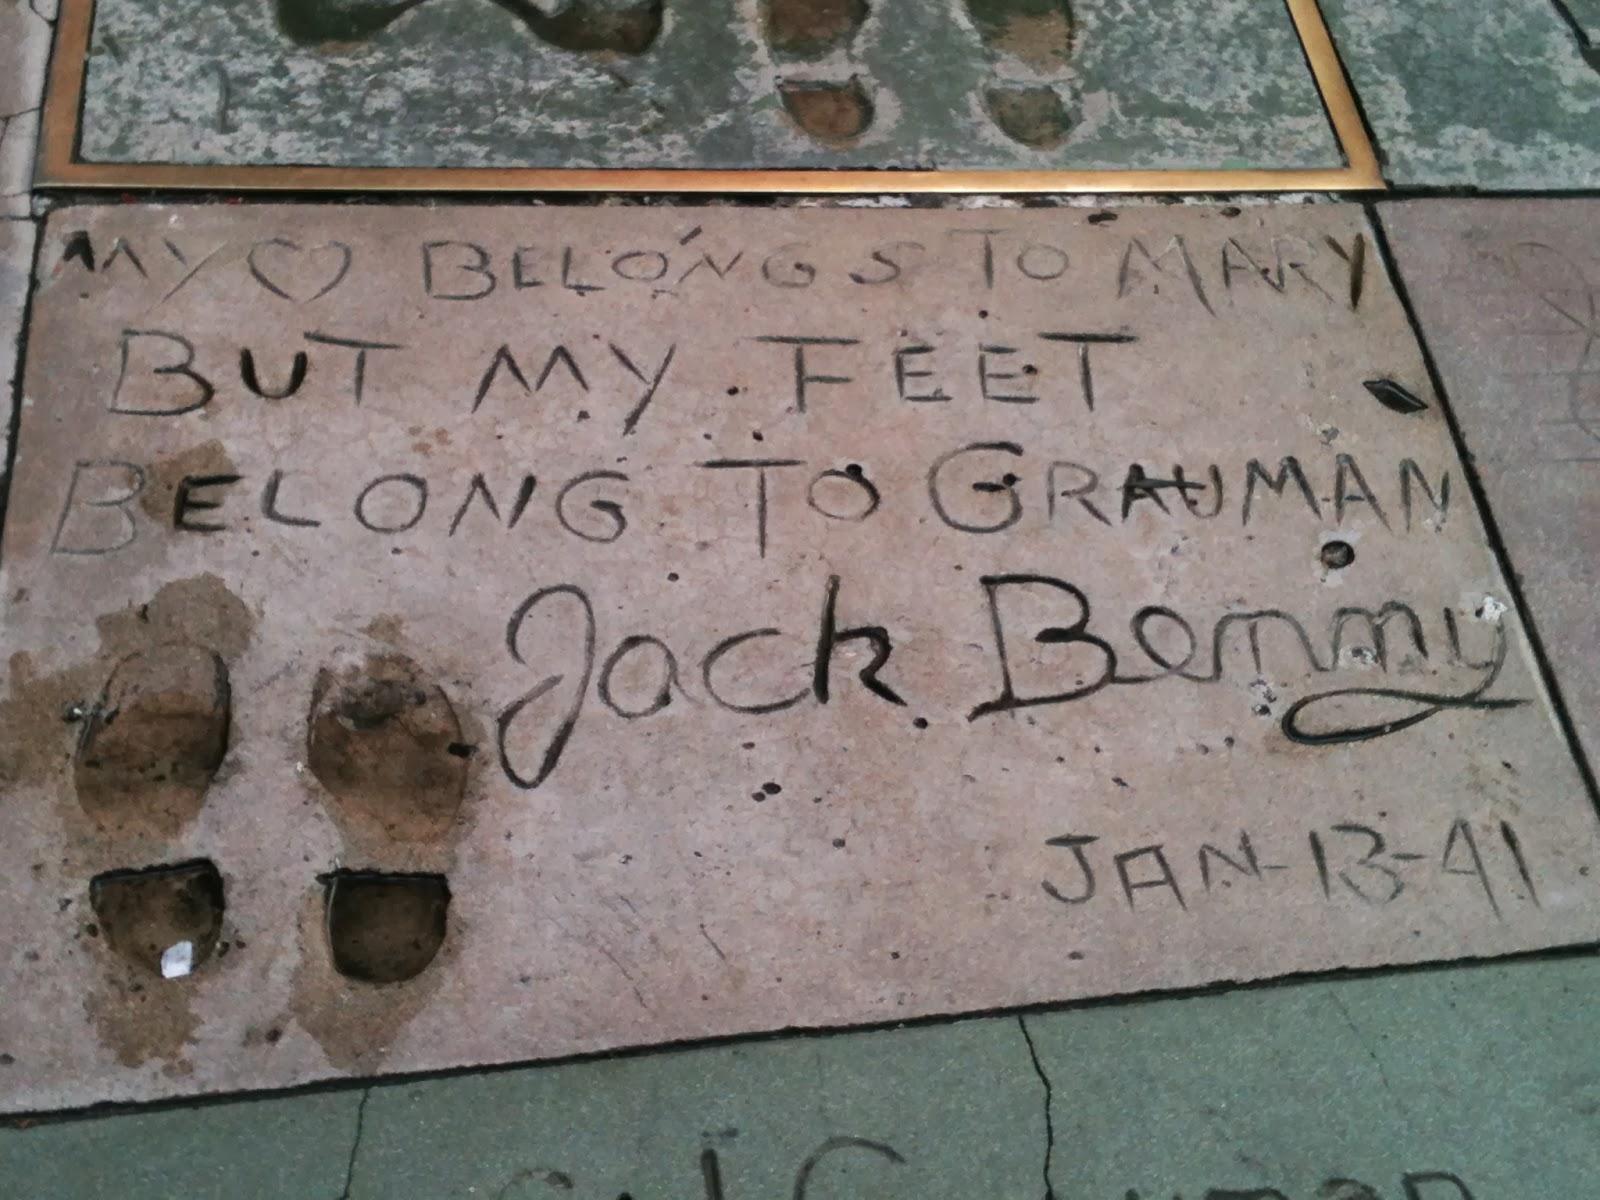 jack benny prints